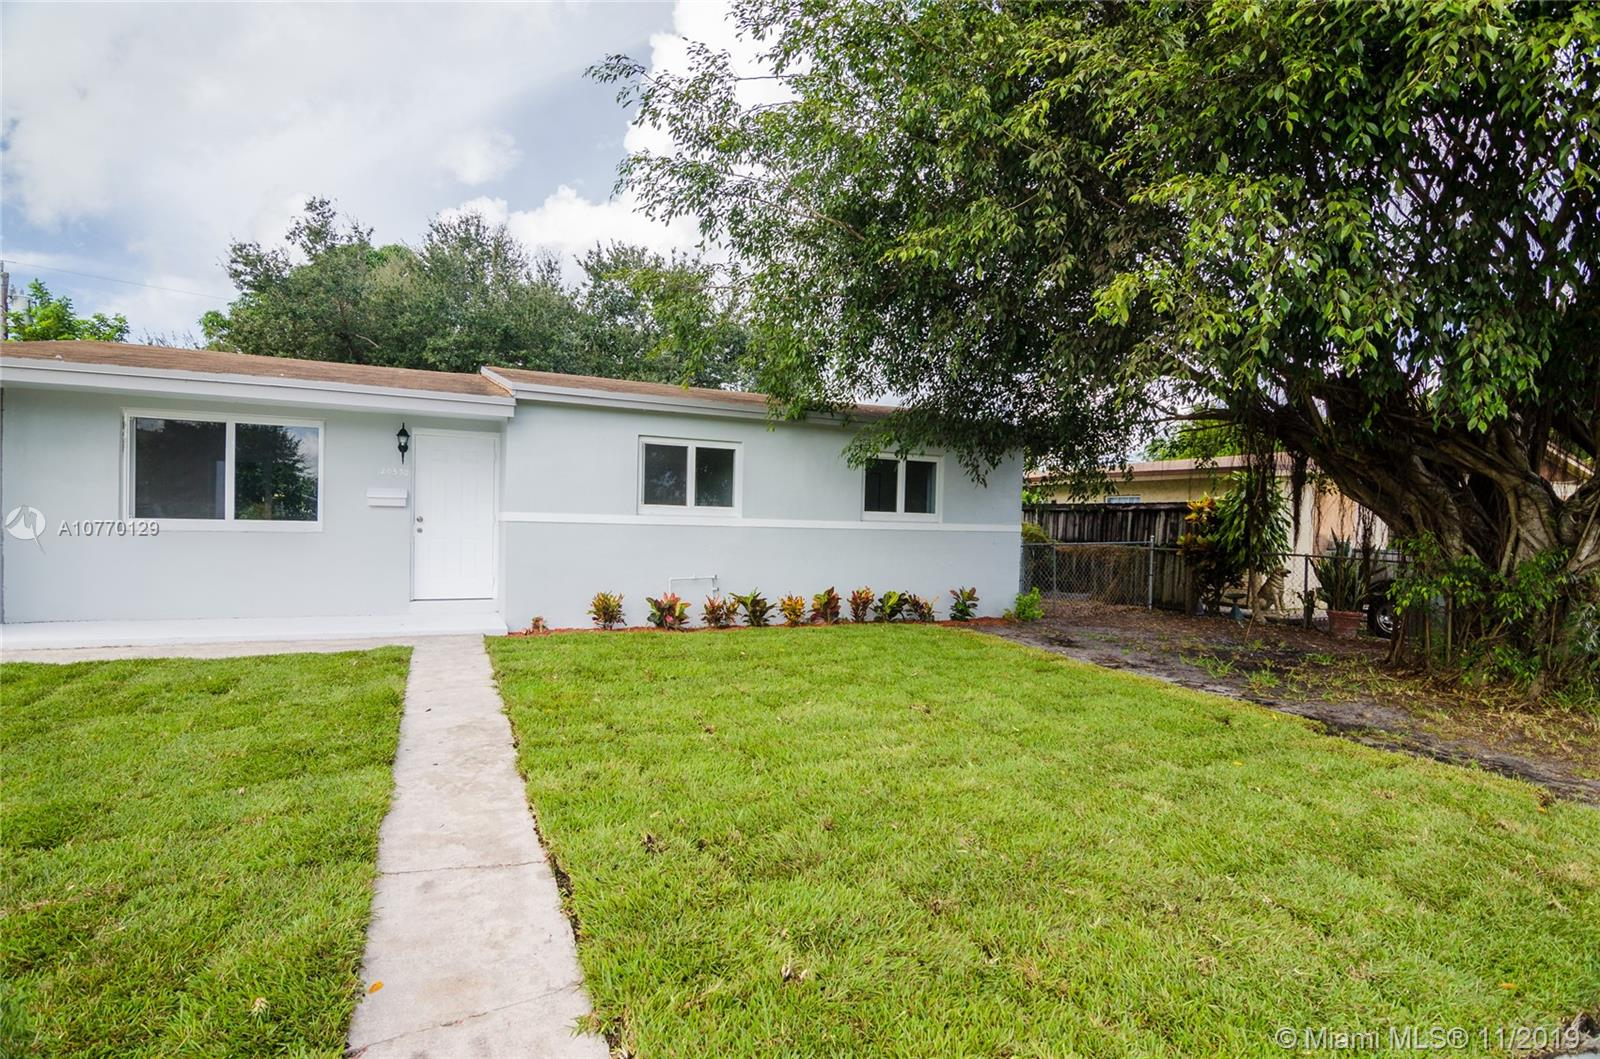 20530 NW 33rd Ave, Miami Gardens, FL 33056